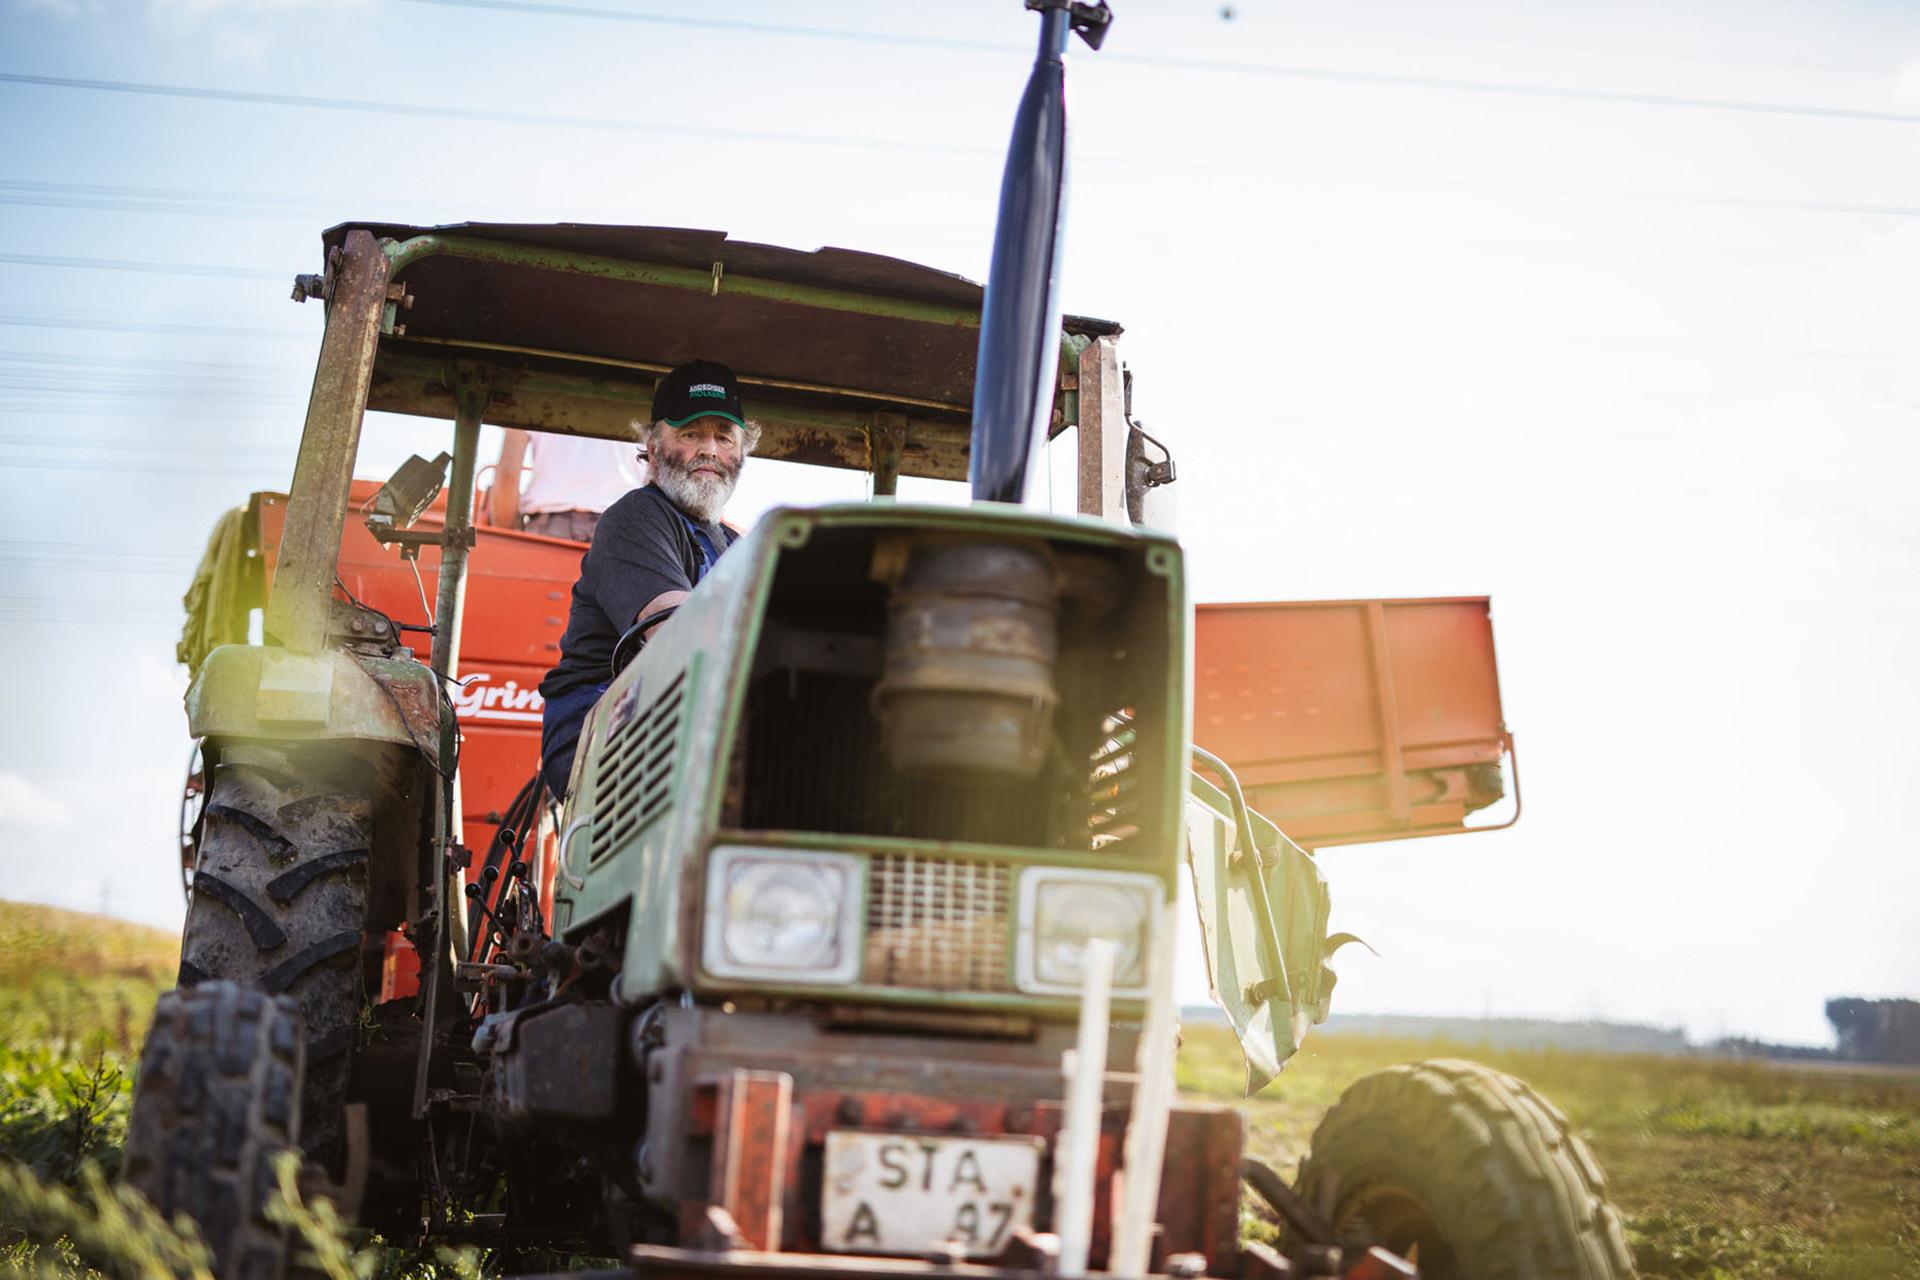 traktor-landwirtschaft-naturland-kampange